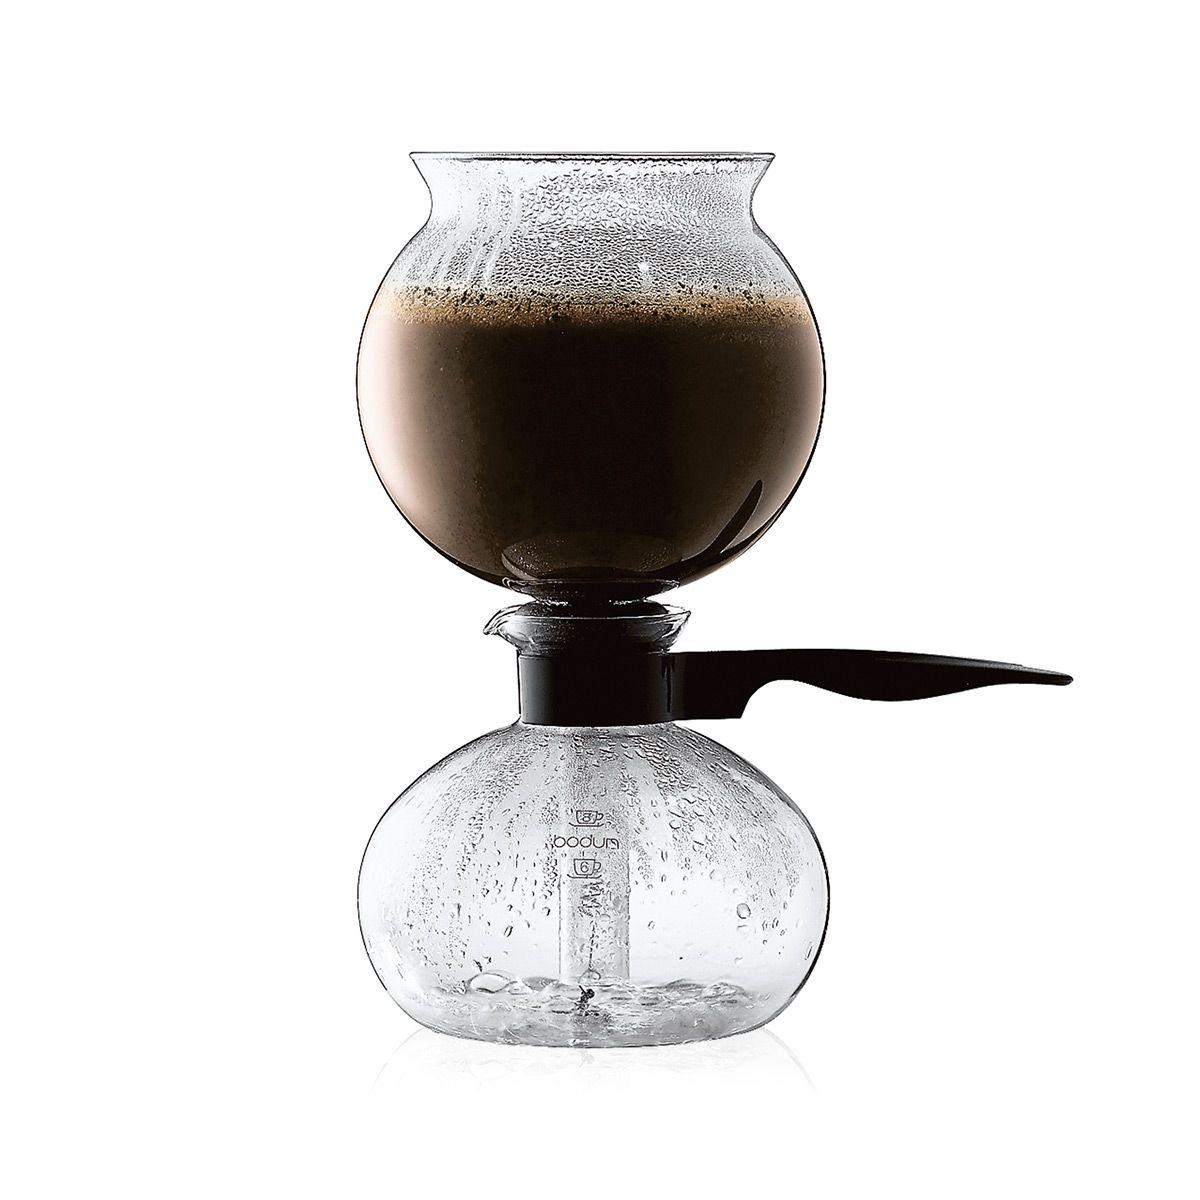 Vacuum Coffee Maker PEBO Bodum